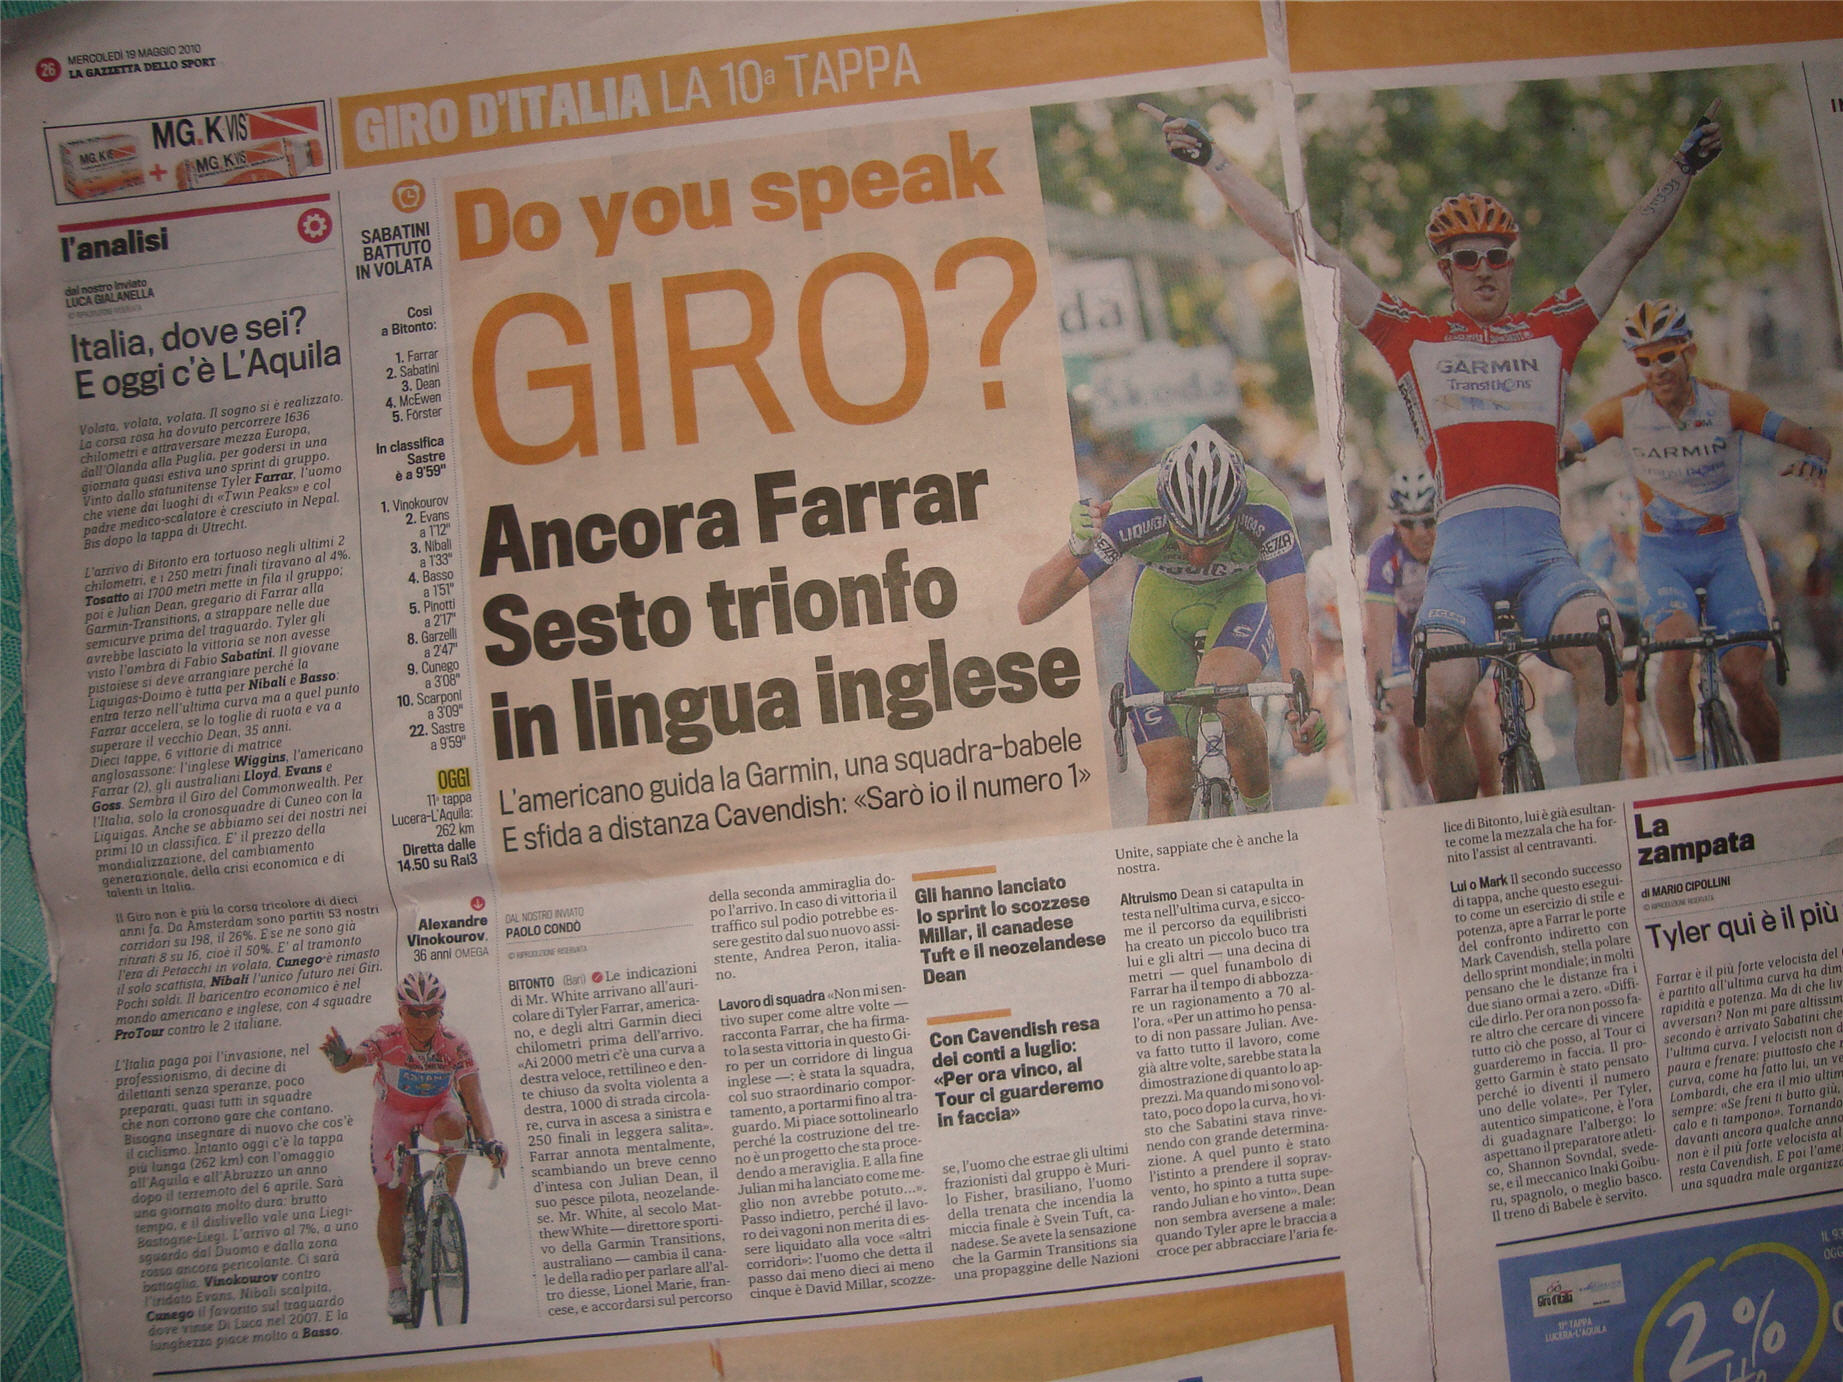 English speaking riders are winning stages - TTT apart, Italians aren't.